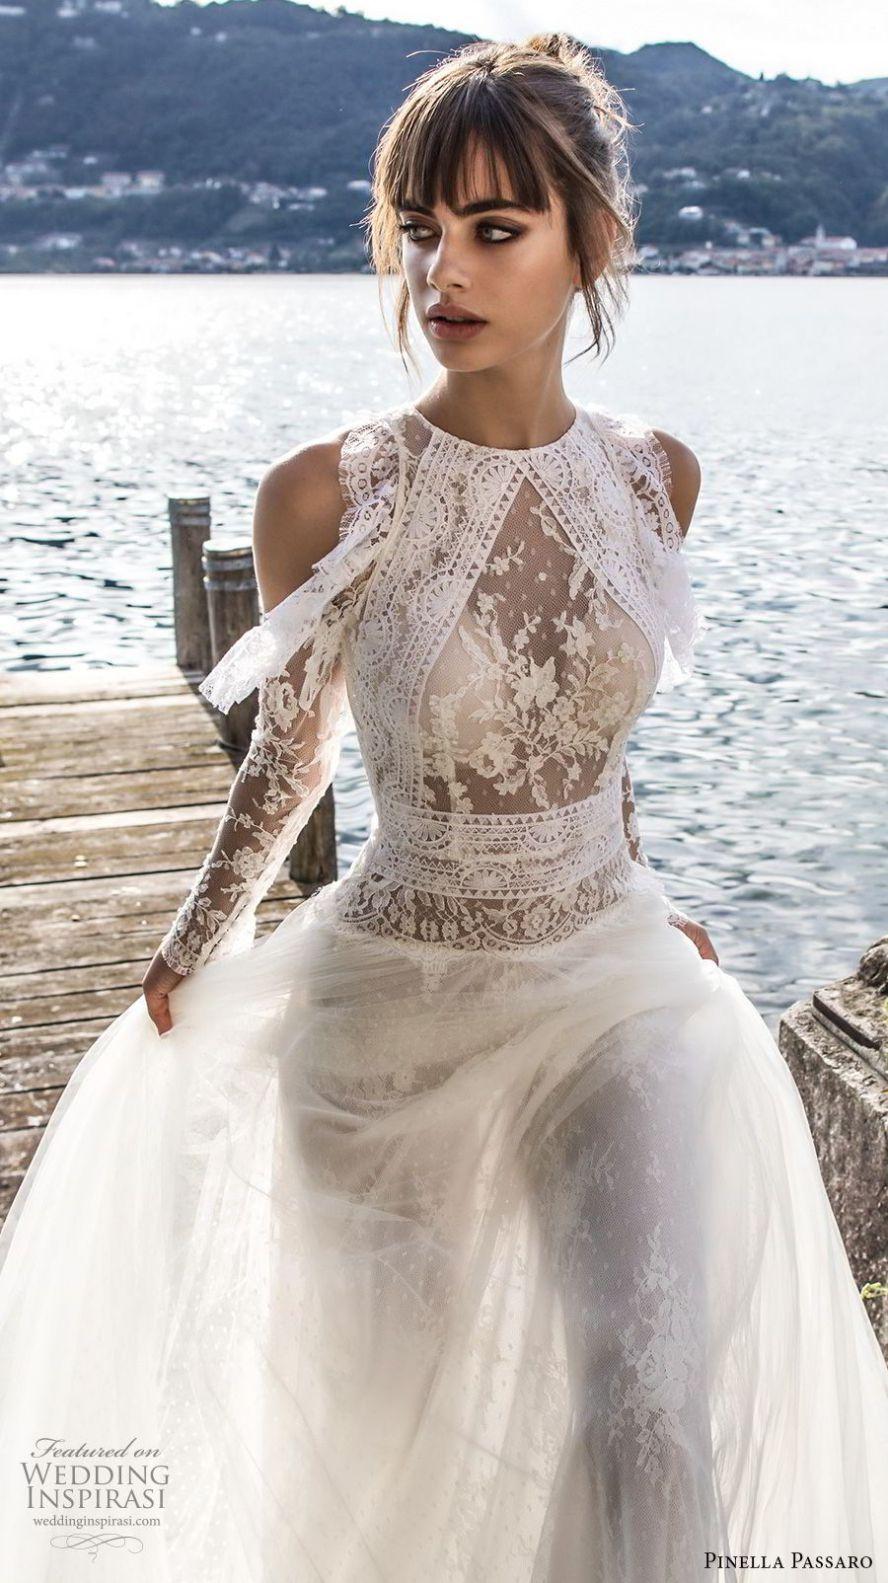 Pinella passaro wedding dresses colorful wedding dresses